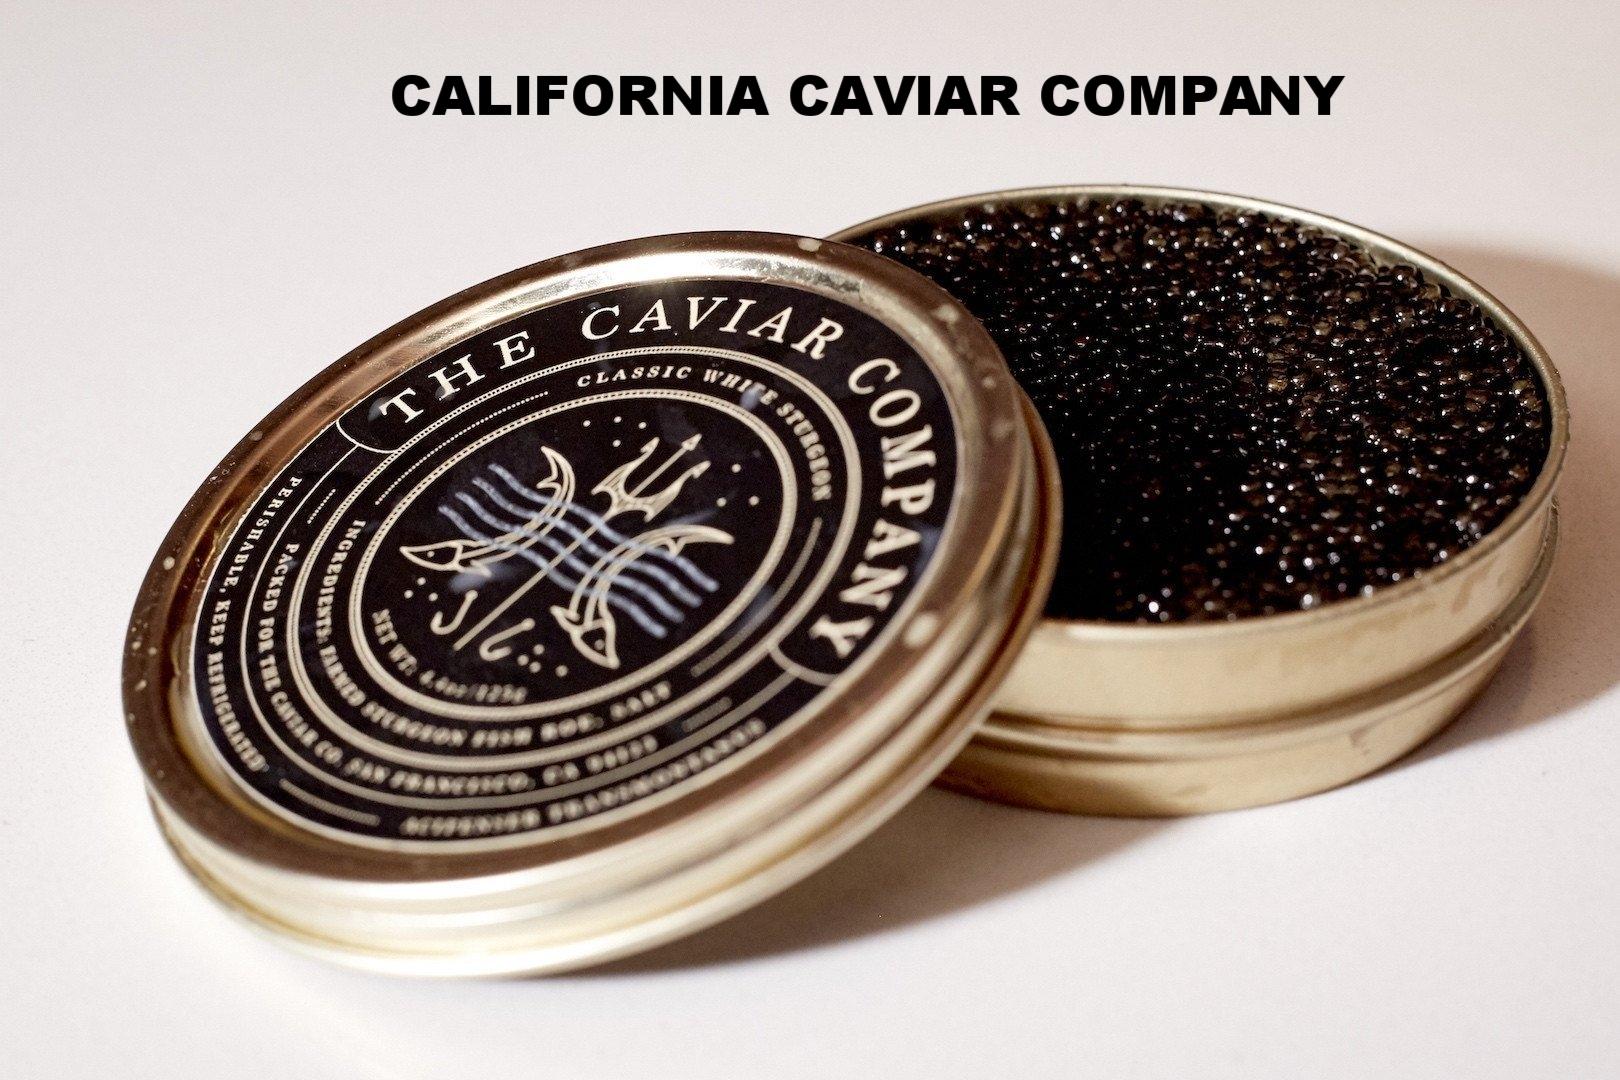 California Caviar Company